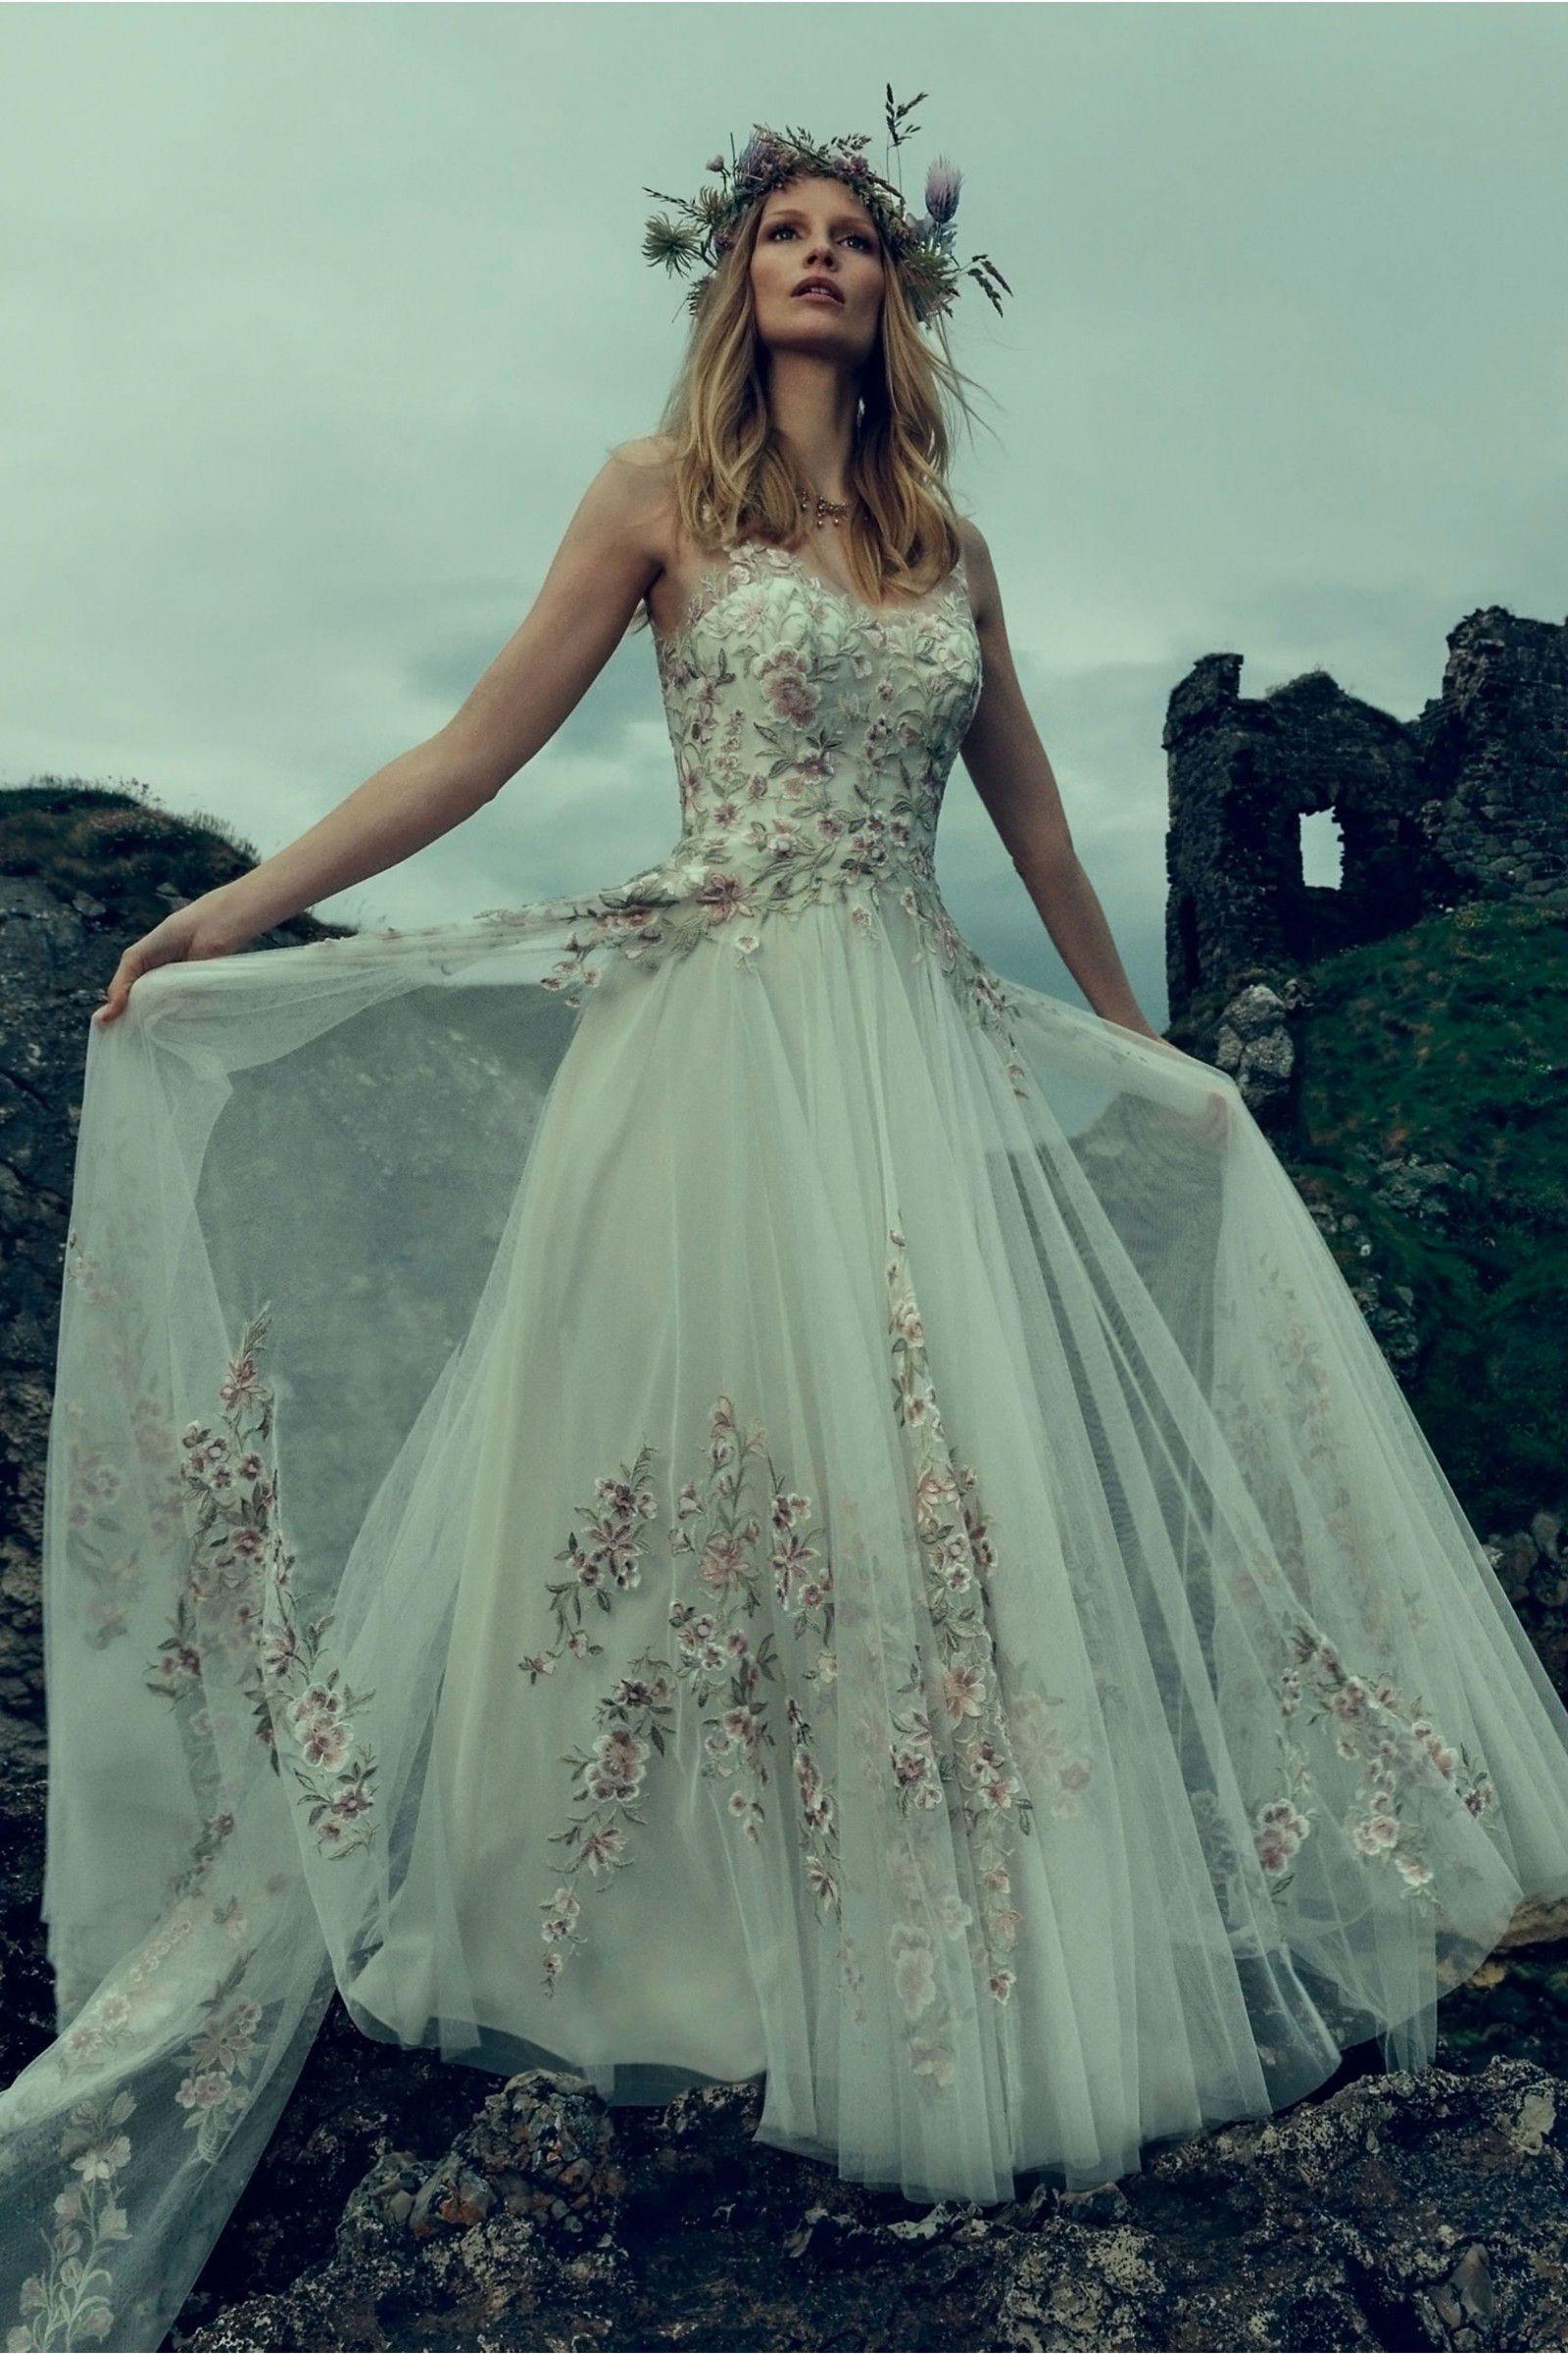 Bhldn Heidi Gown Preowned Wedding Dress On Sale 51 Off Preowned Wedding Dresses A Line Bridal Gowns Lace Bridal Gown,Indian Wedding Lehenga Dress Girls